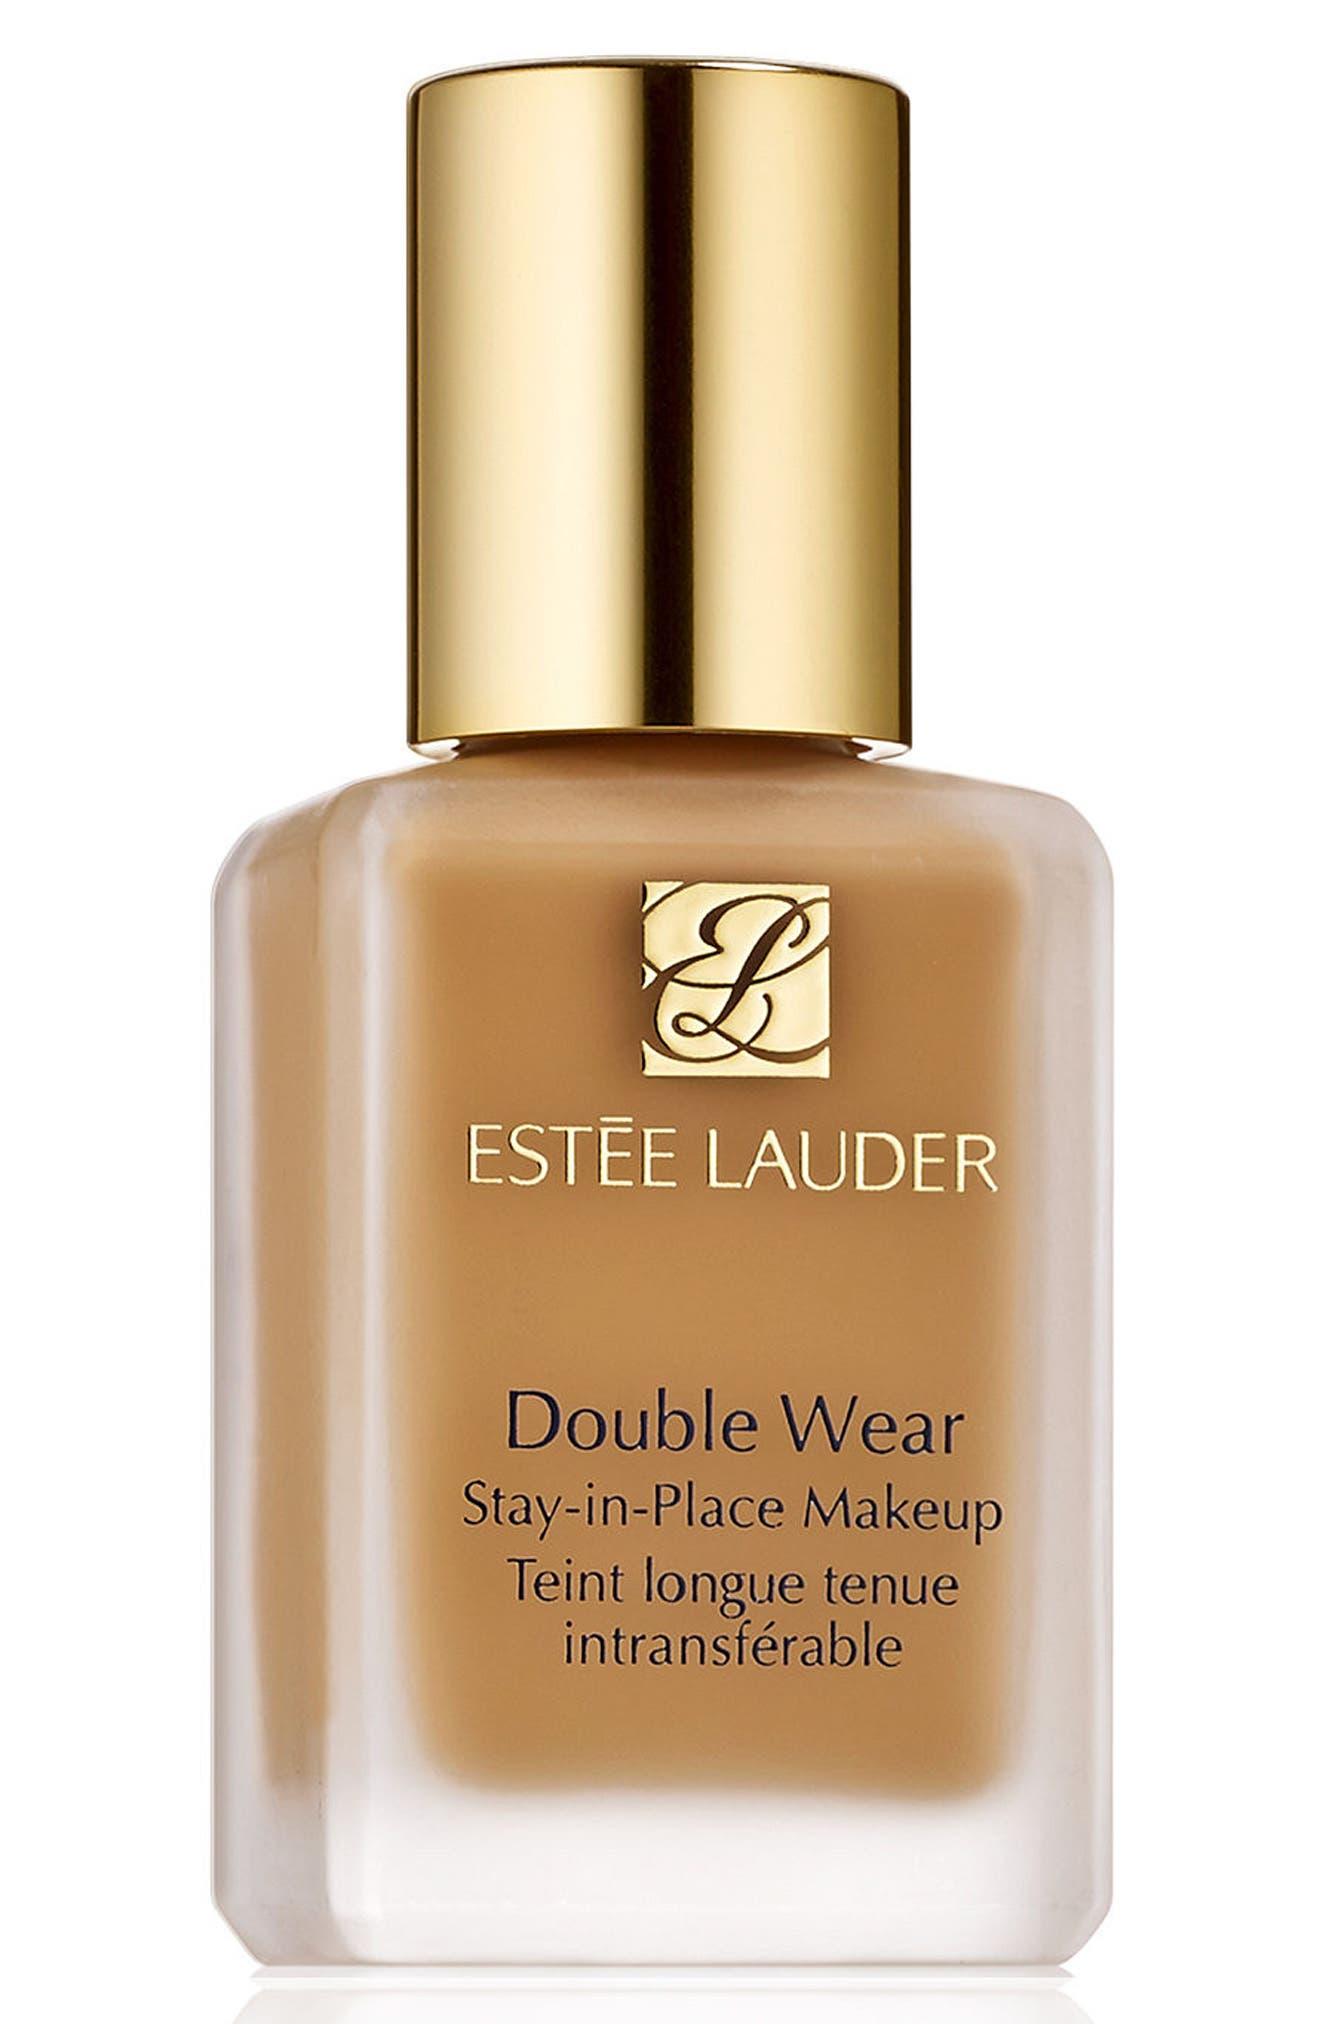 Estee Lauder Double Wear Stay-In-Place Liquid Makeup - 3N2 Wheat